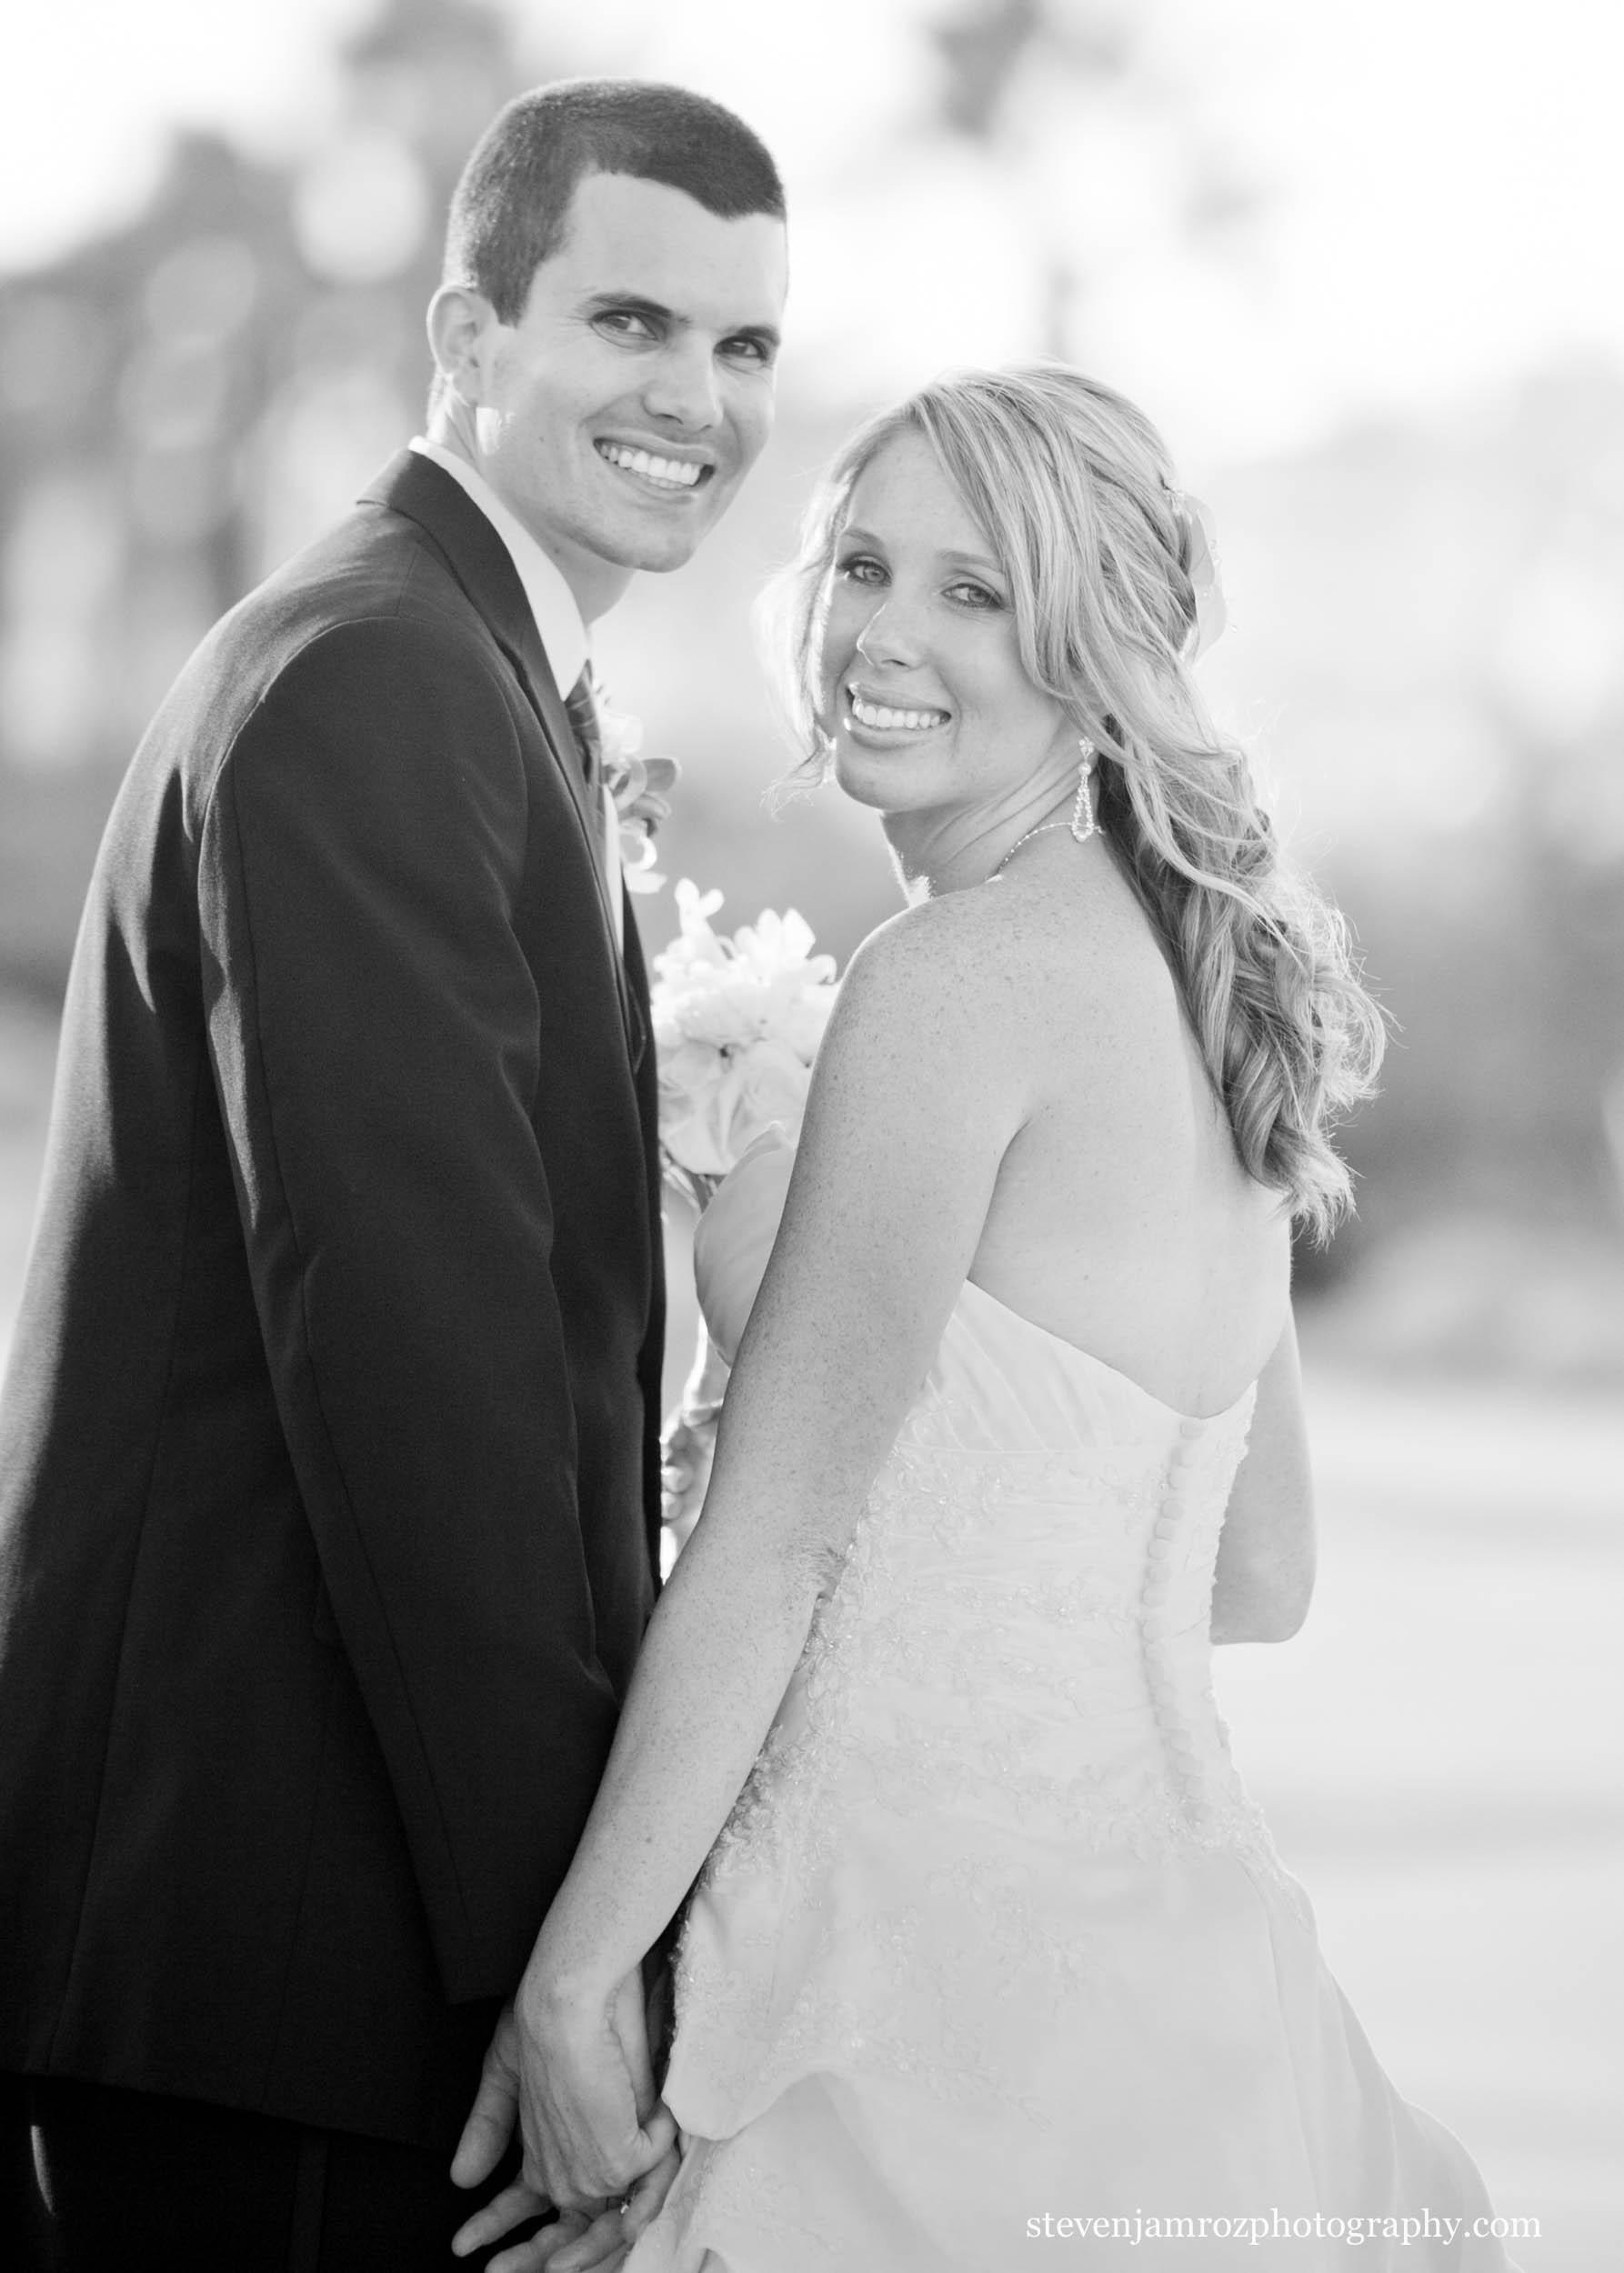 bride-holds-hands-groom-nc-steven-jamroz-photography-0193.jpg